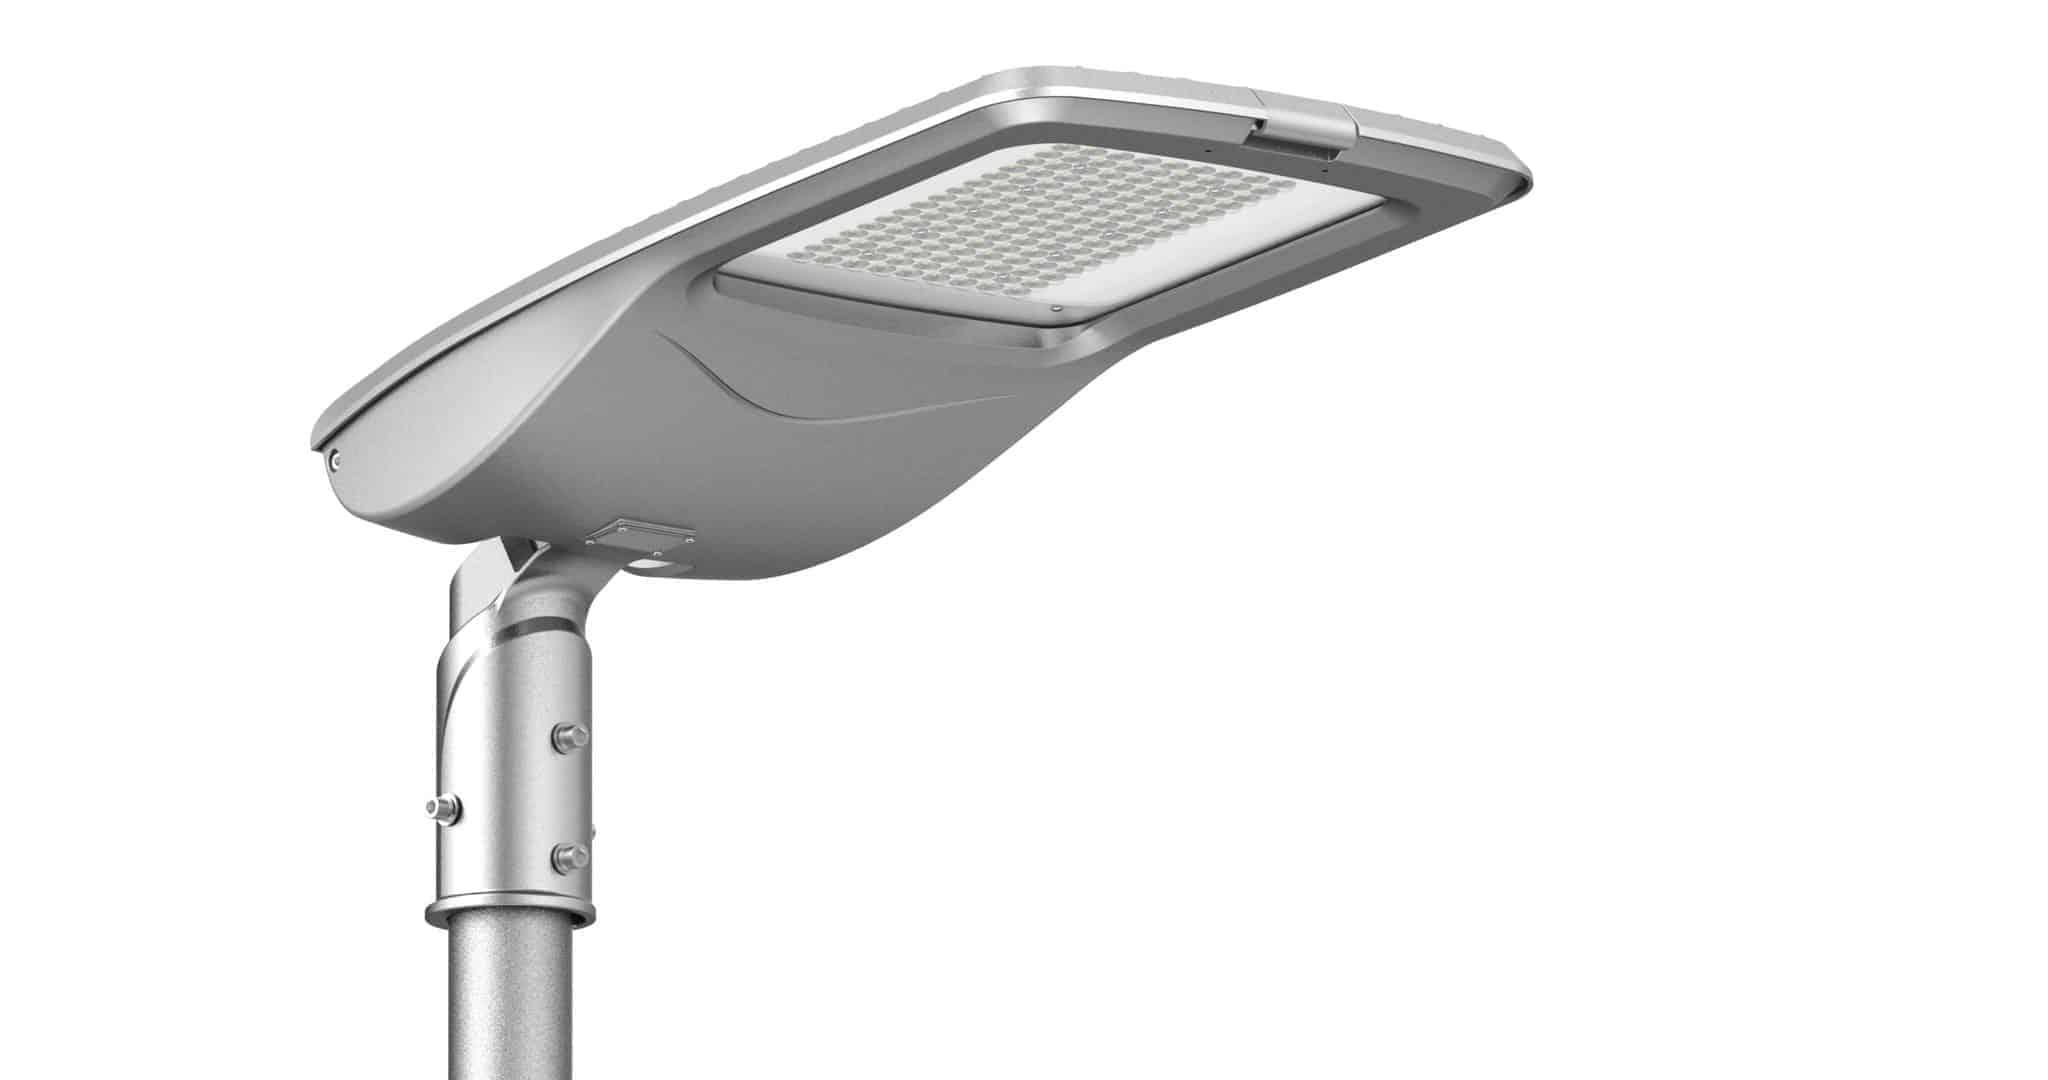 MBL-GC HSO LED Térvilágítási lámpafej